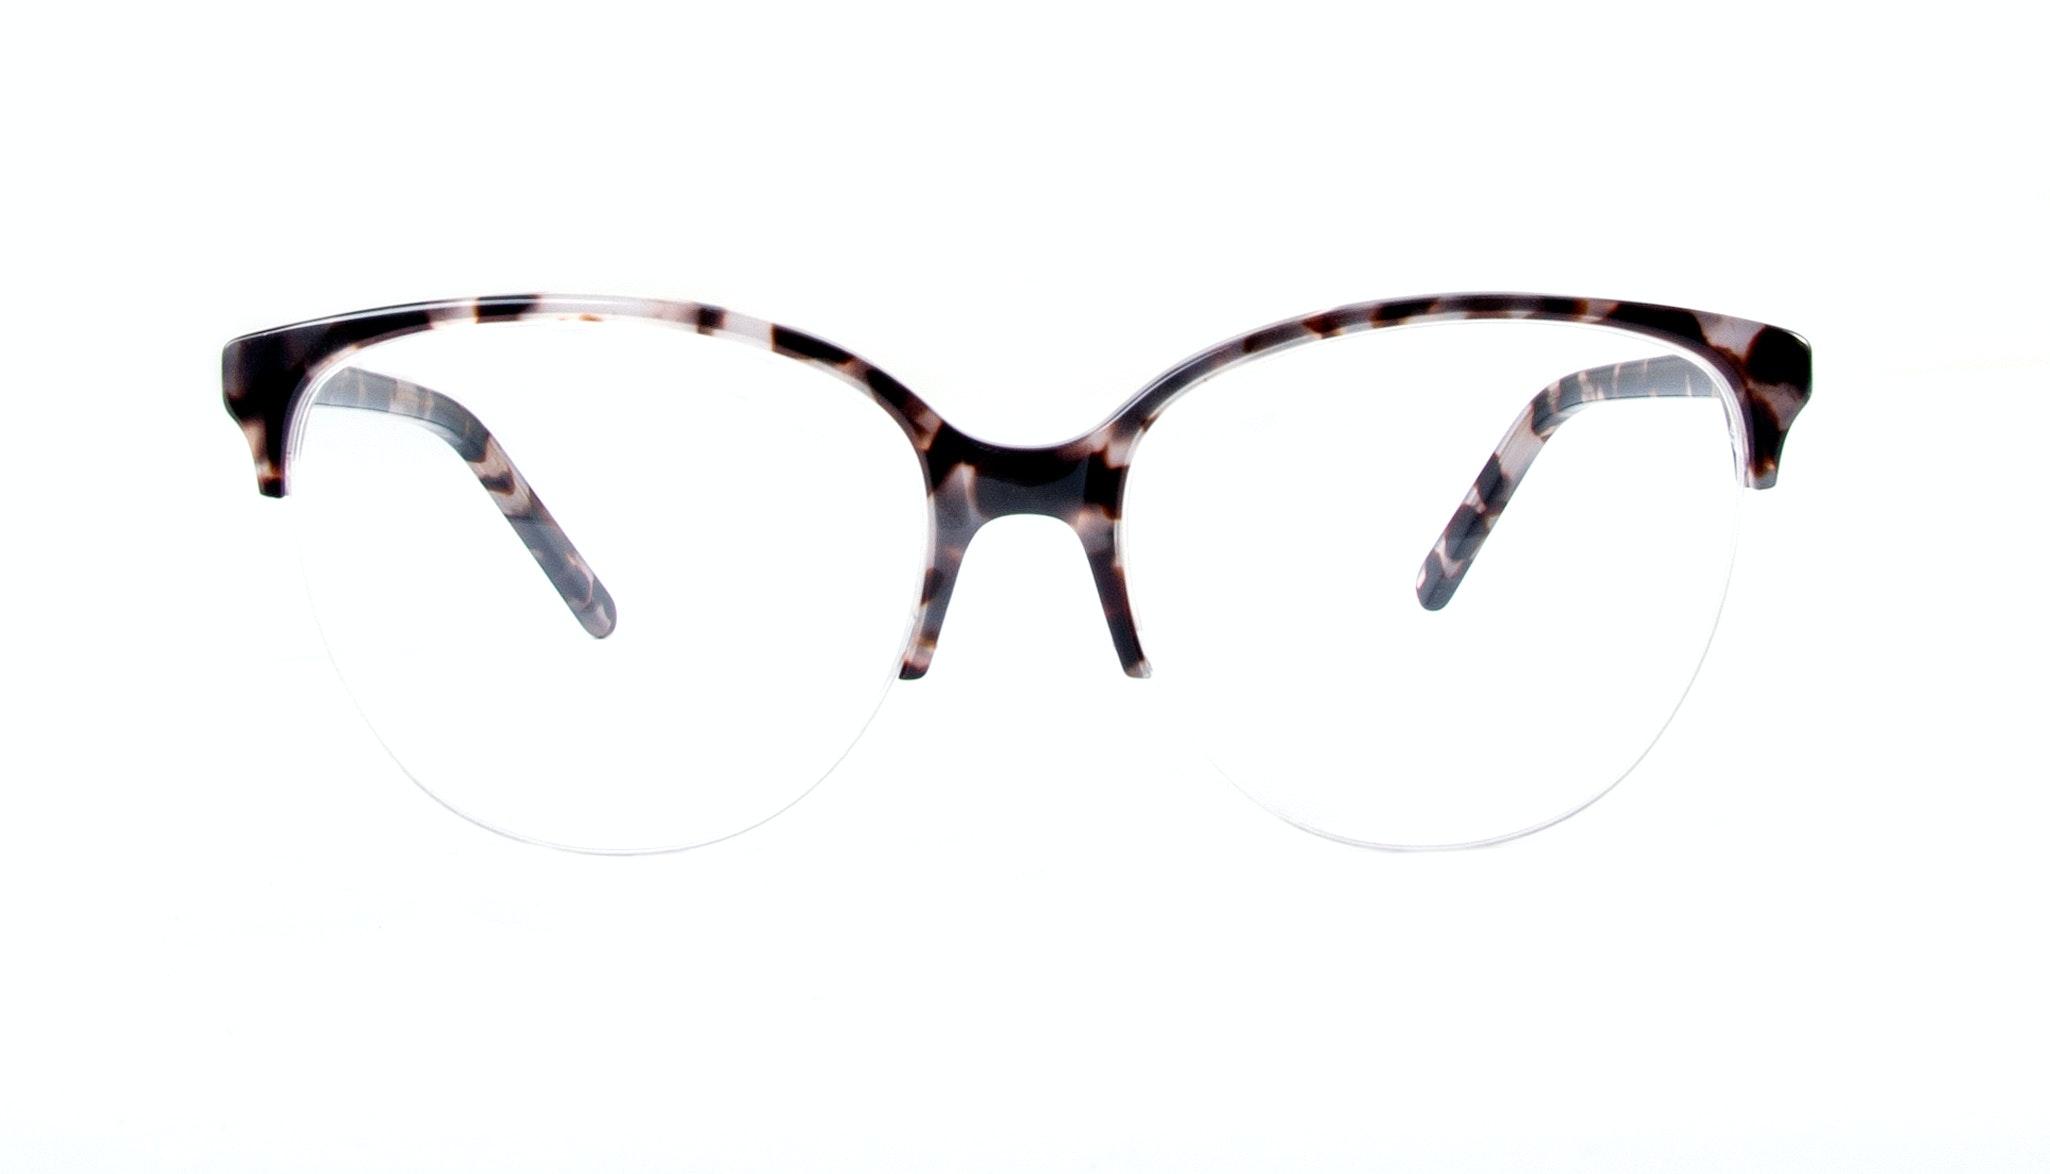 Affordable Fashion Glasses Cat Eye Round Semi-Rimless Eyeglasses Women Imagine Light Mocha Tortoise Front